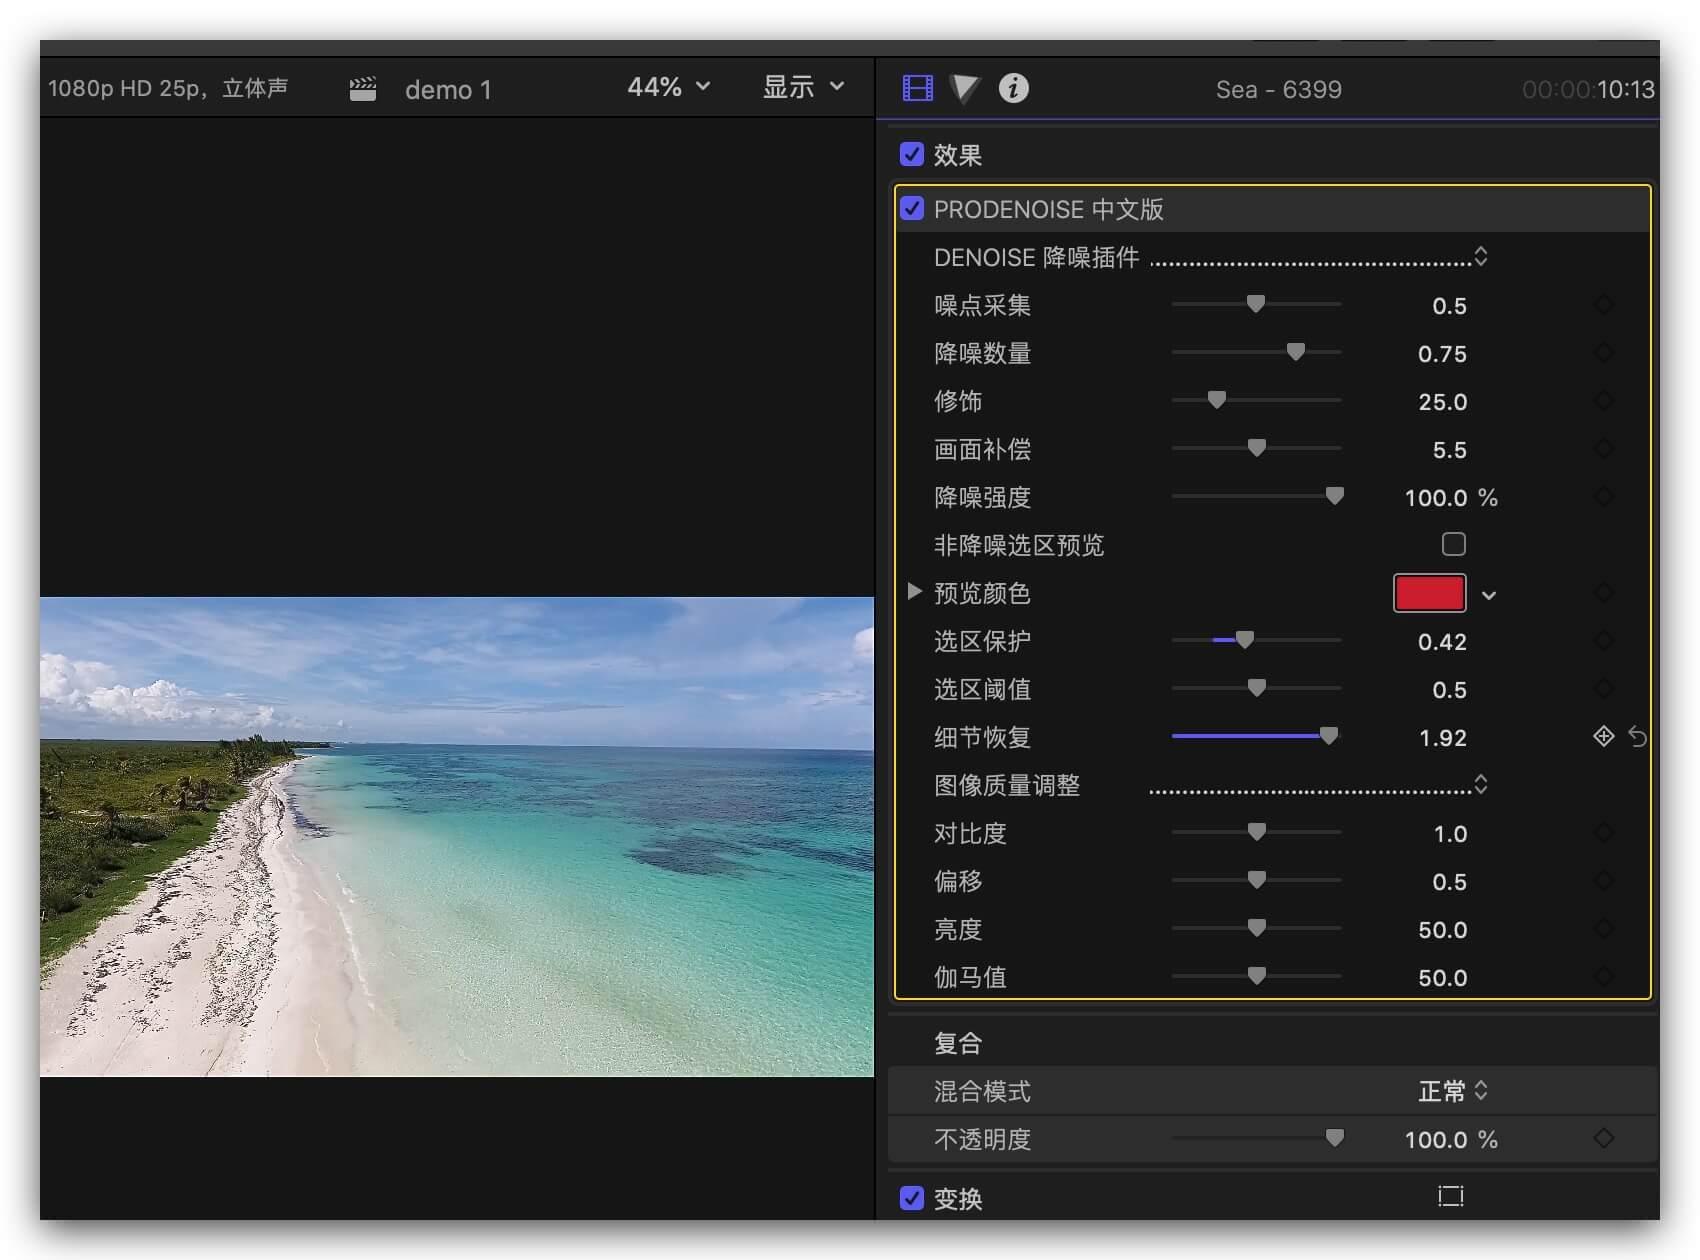 fcpx专业视频降噪插件 ProDenoise 中文版 支持fcpx 10.4.10+使用参考